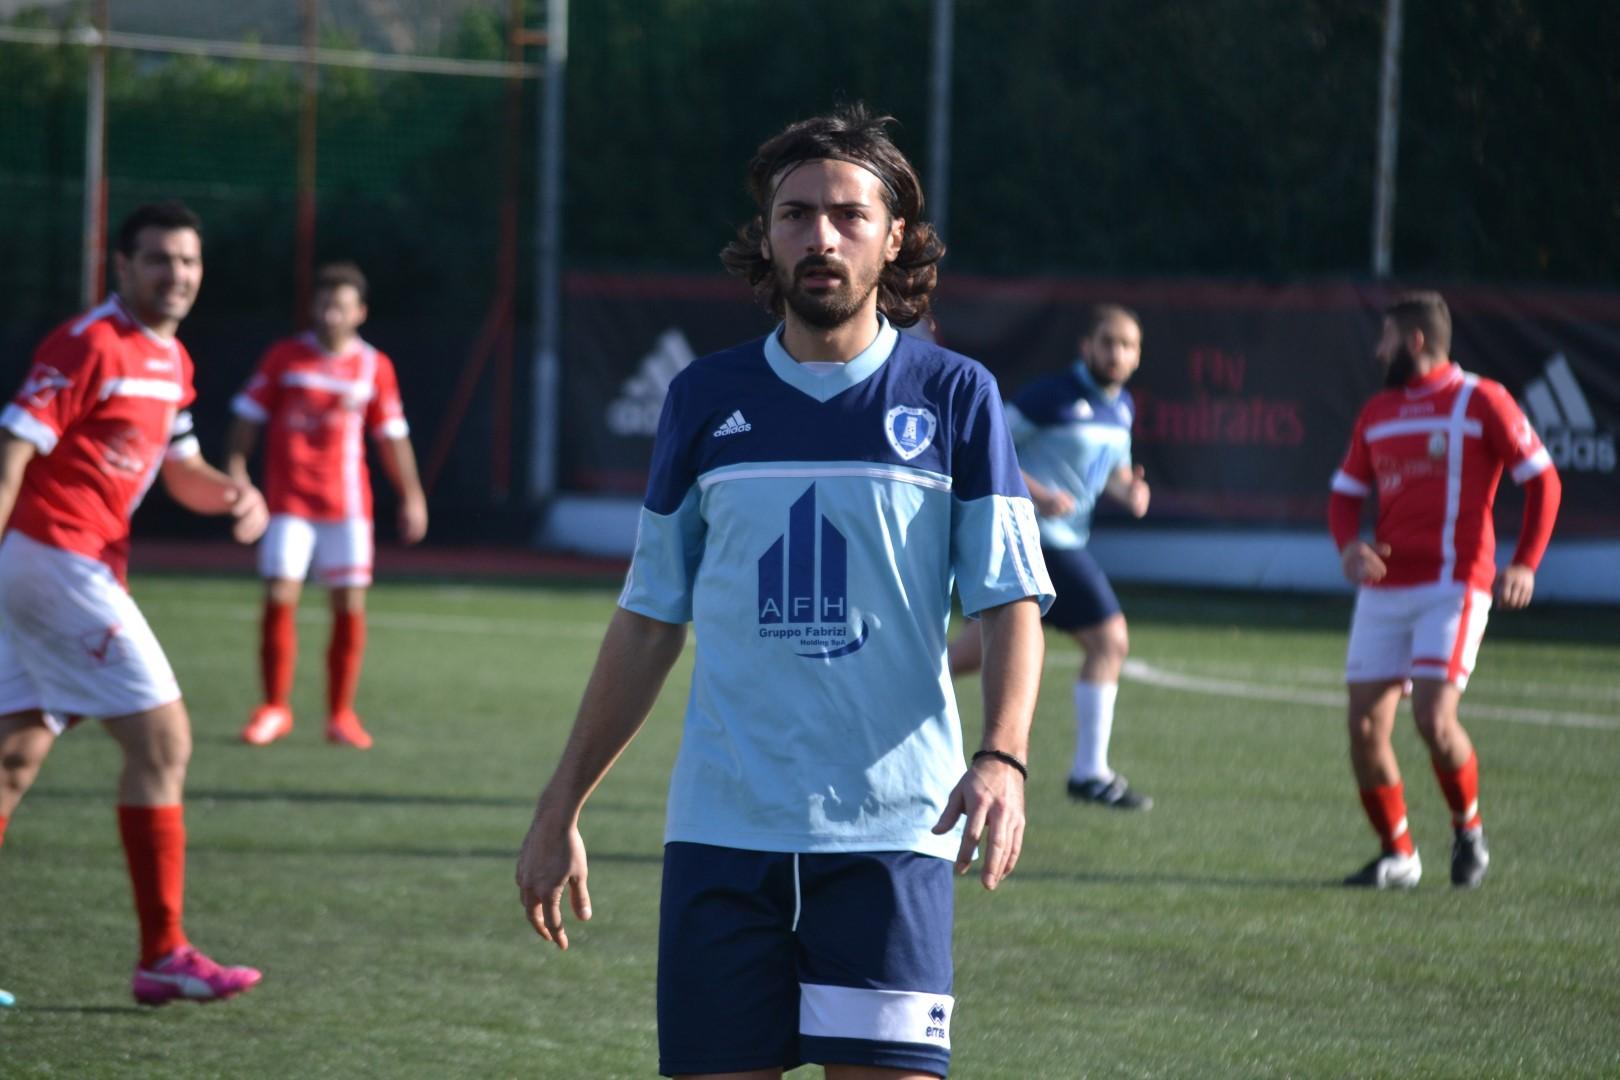 Mauro Ferrazza